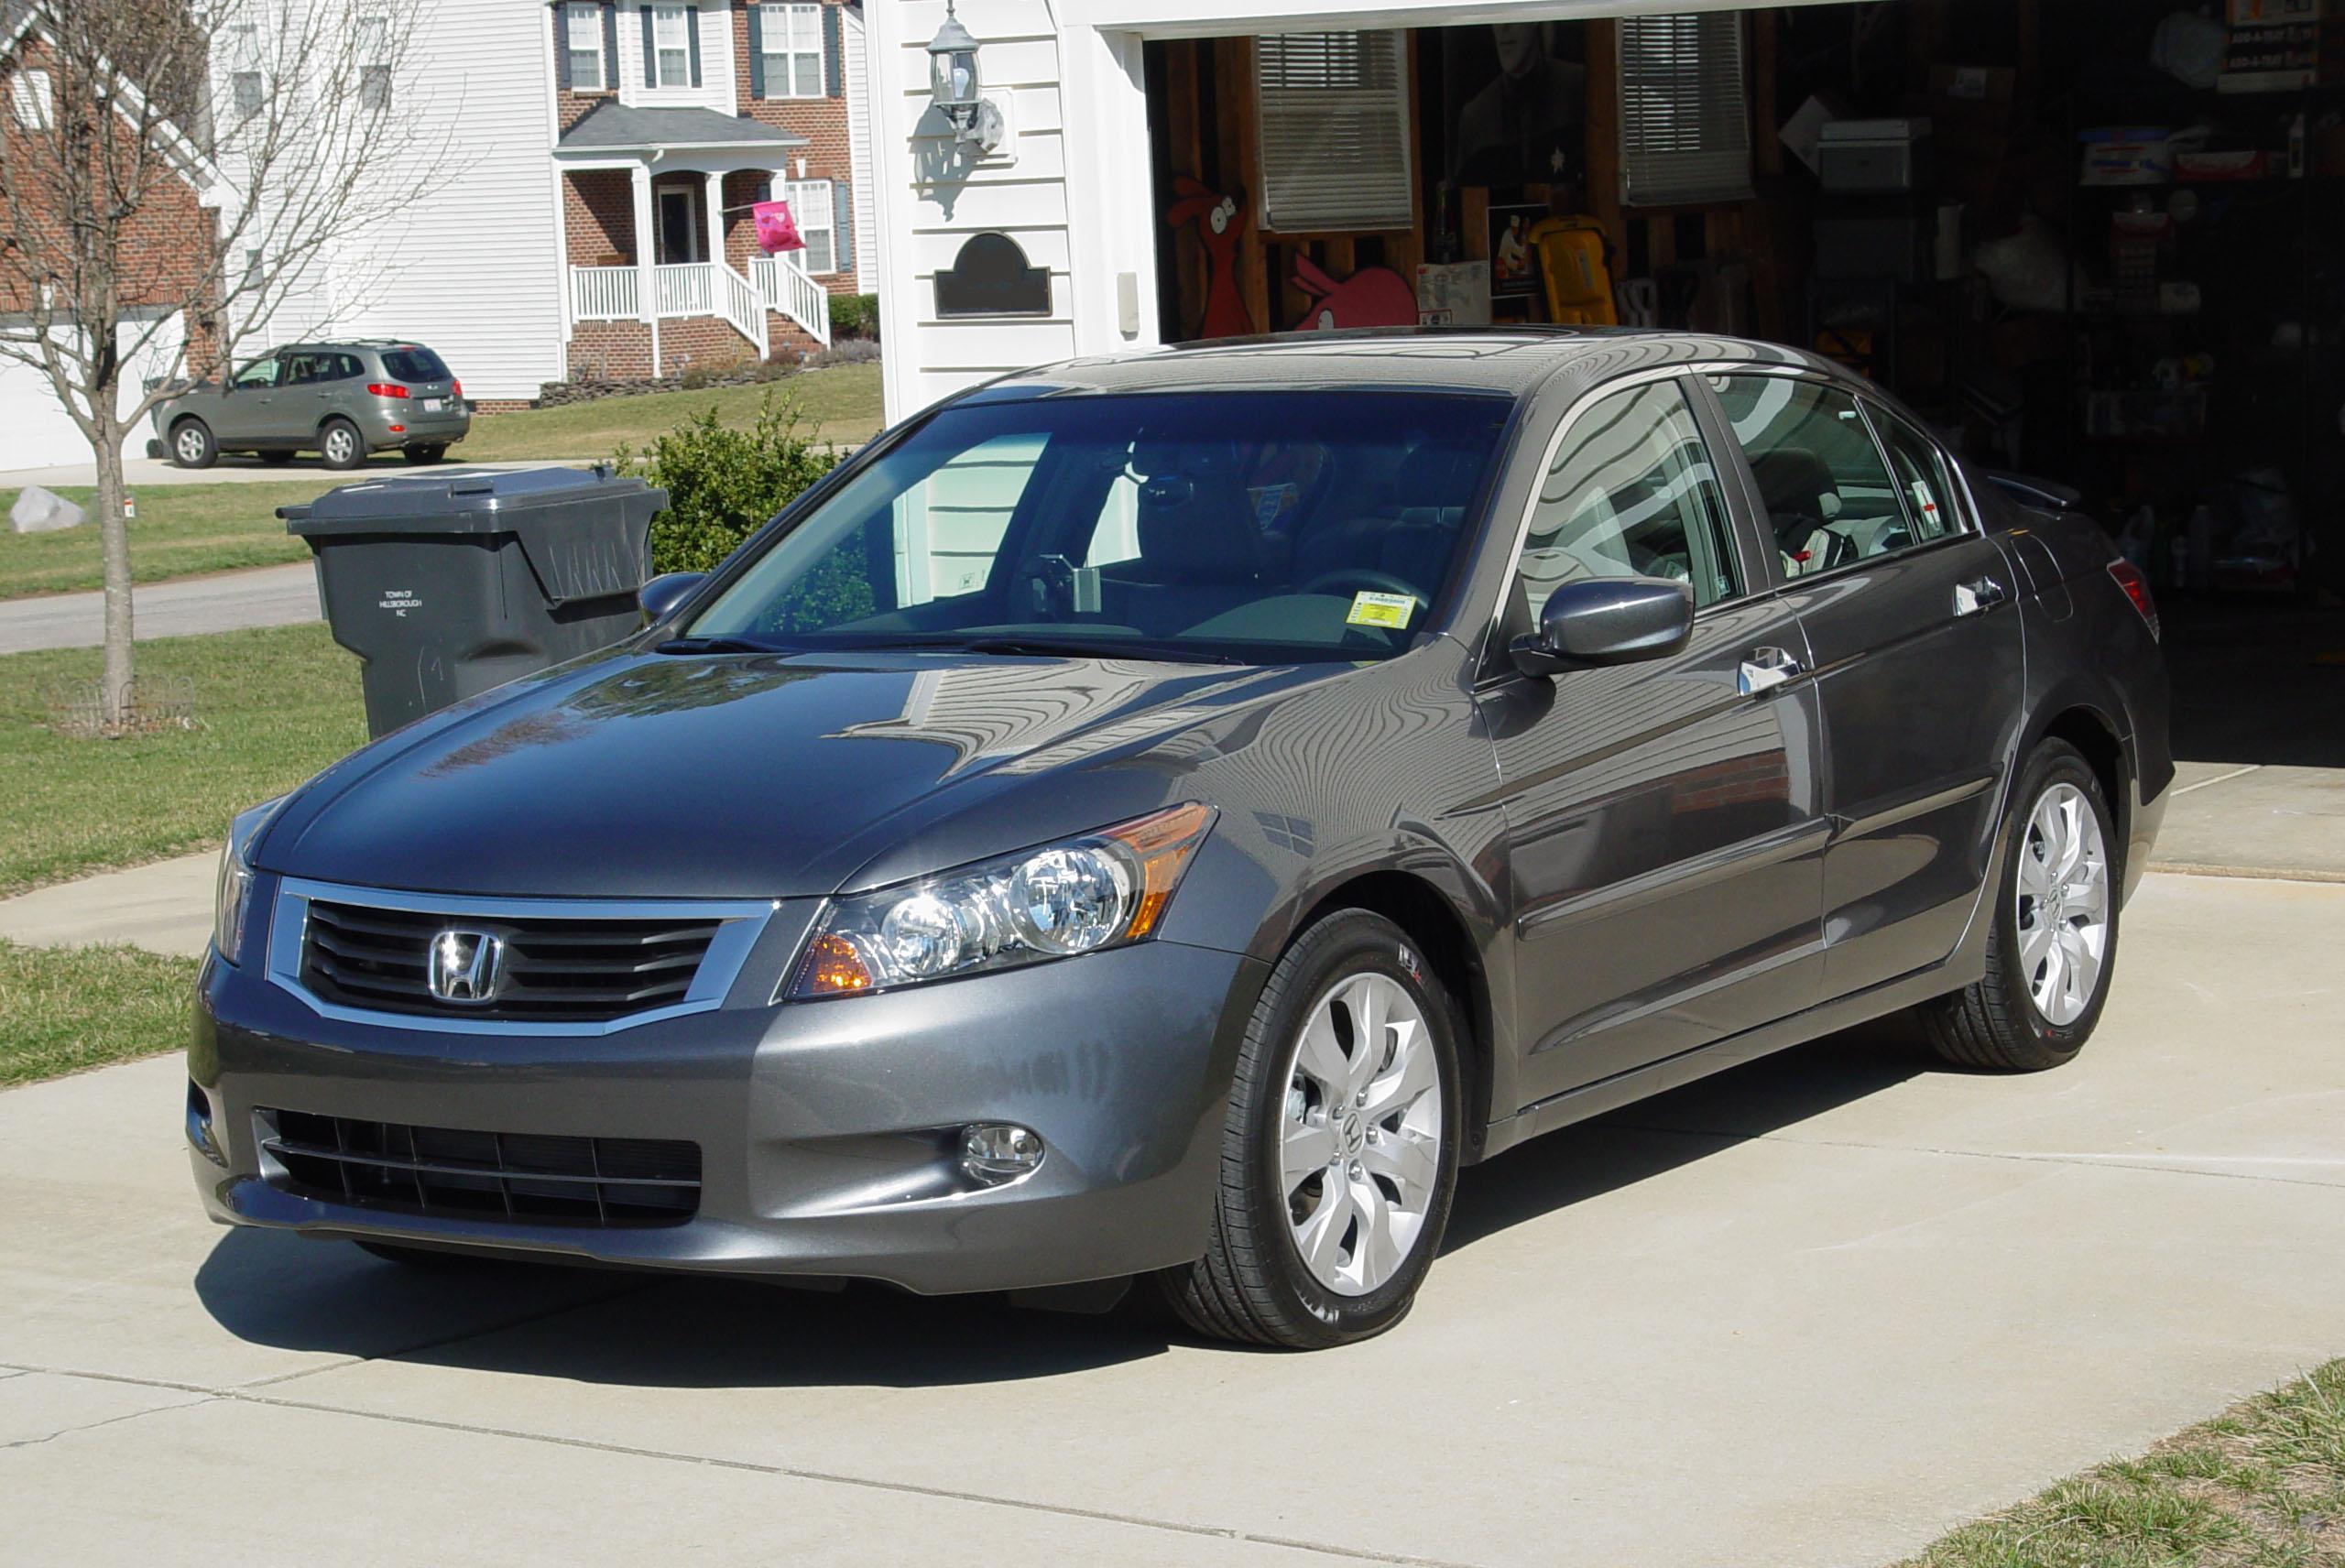 2008 Honda Accord Ex L V6 >> File 2008 Honda Accord Exl V6 Sedan 01 Jpg Wikimedia Commons